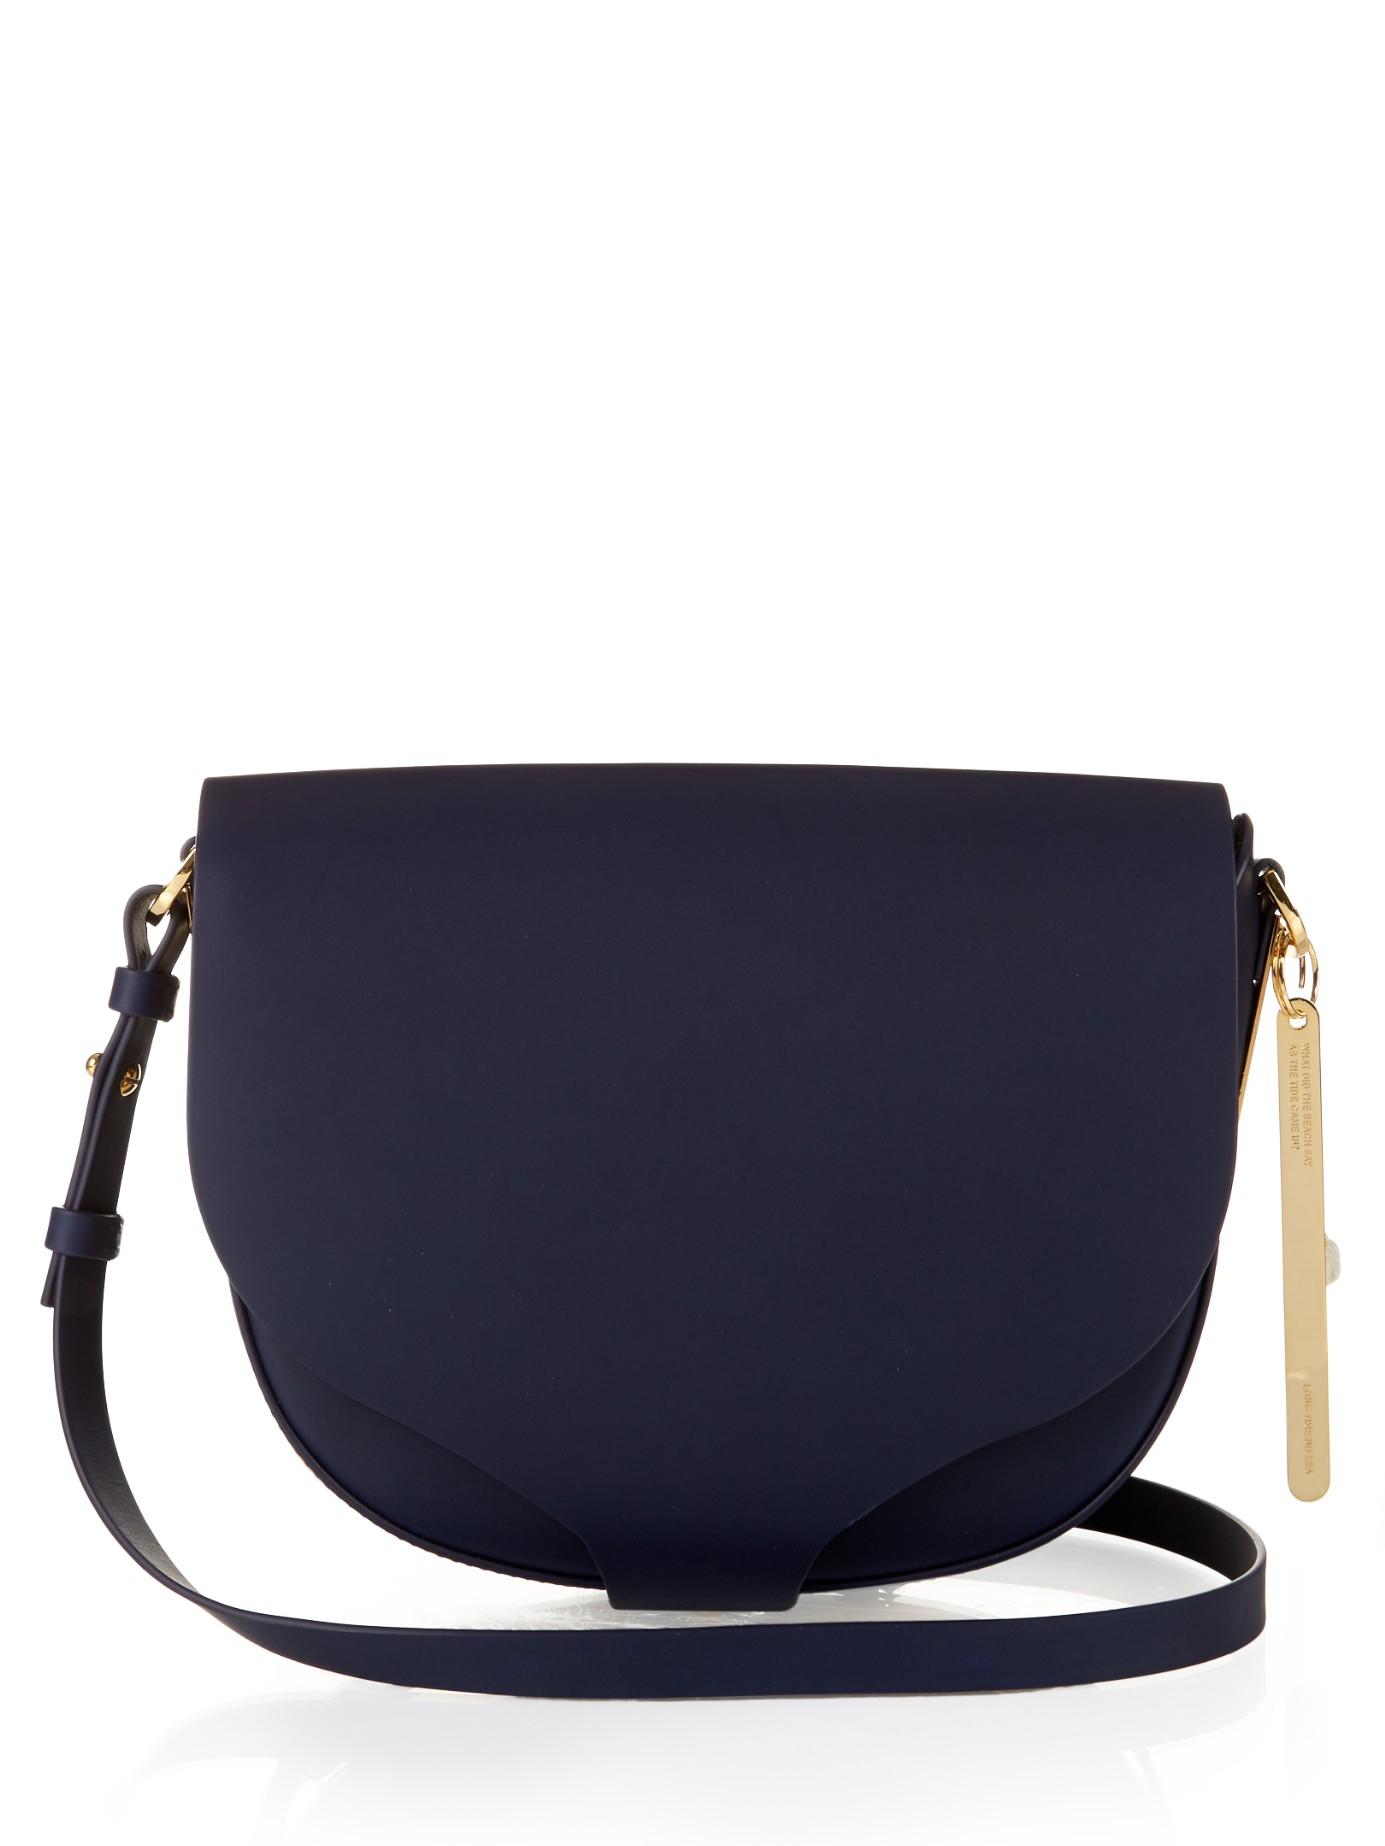 41e44aaf4ee3 Lyst - Sophie Hulme Barnsbury Medium Leather Cross-body Bag in Blue